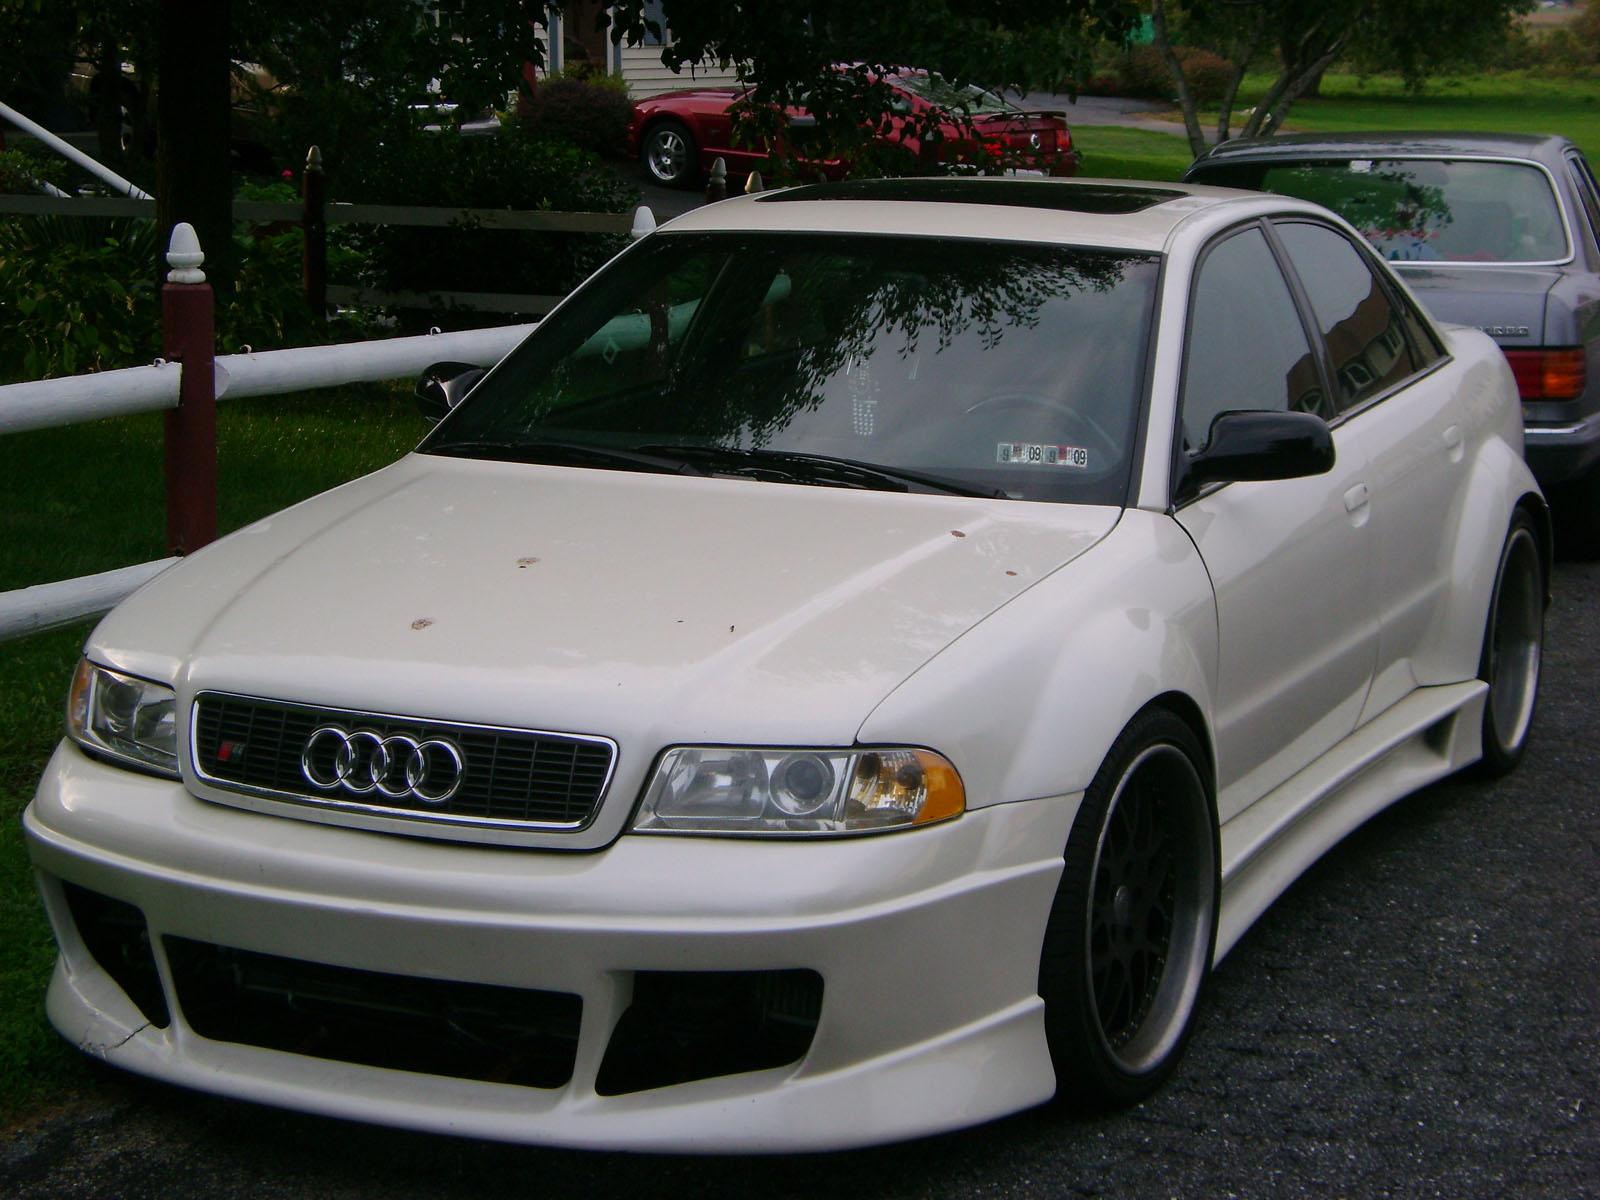 2000 Audi S4 For Sale   Lancaster Pennsylvania